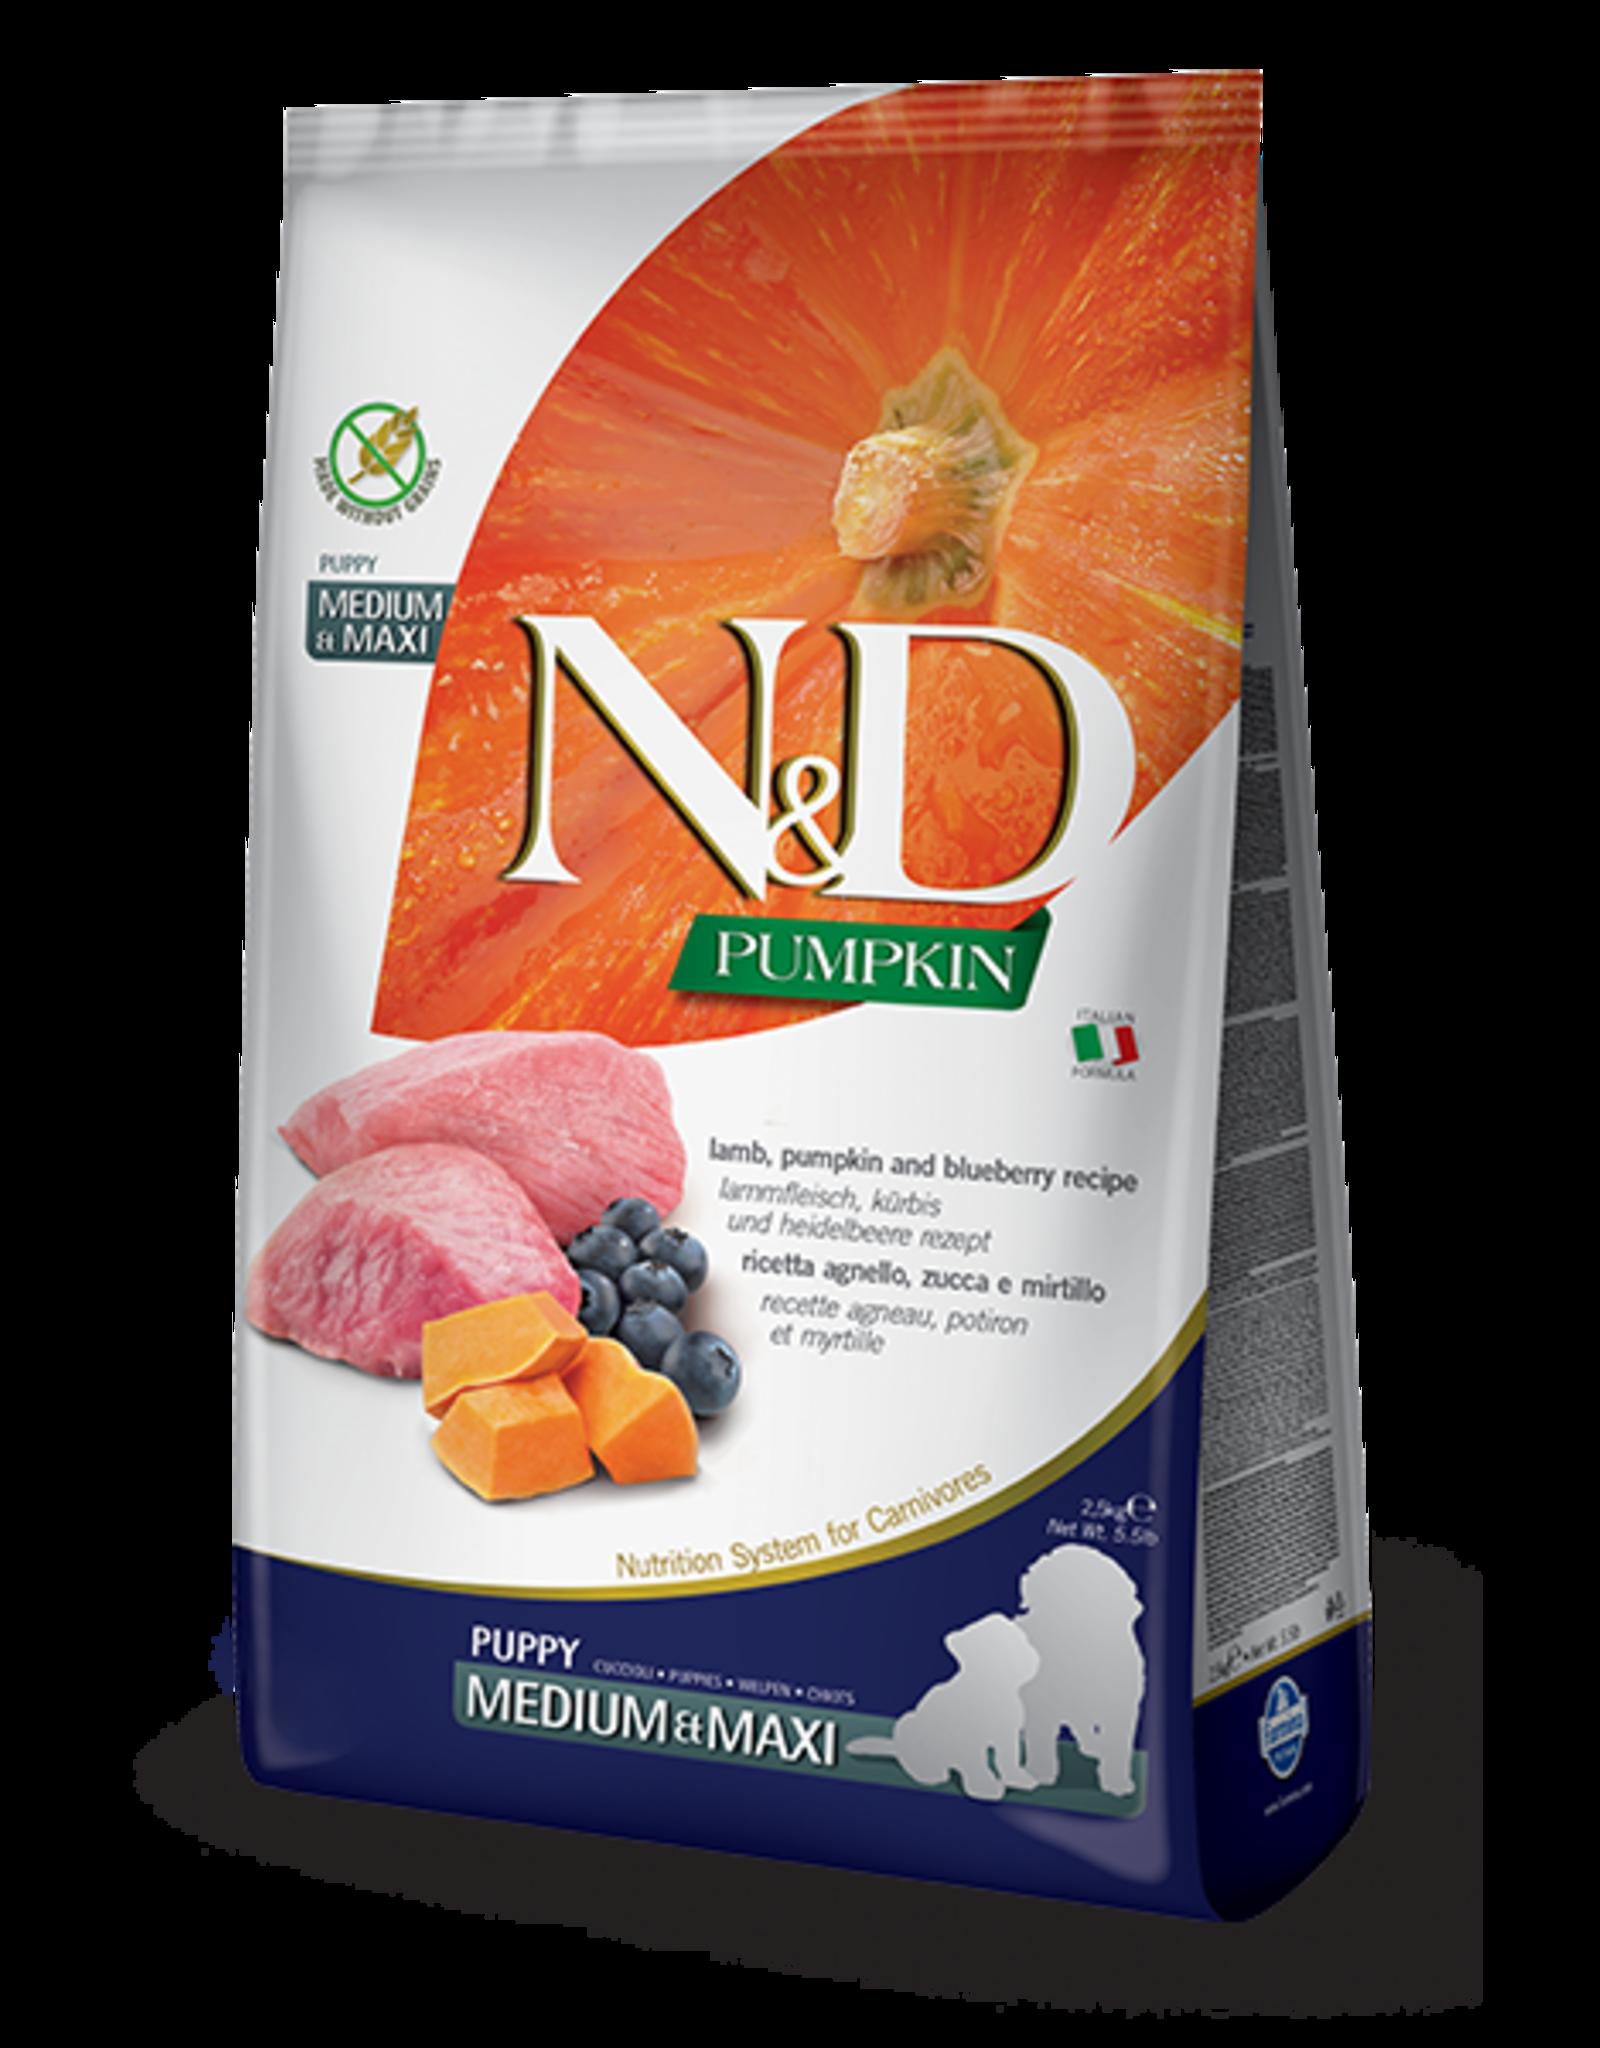 N&D Pumpkin Grain-Free Lamb & Blueberry Puppy Food